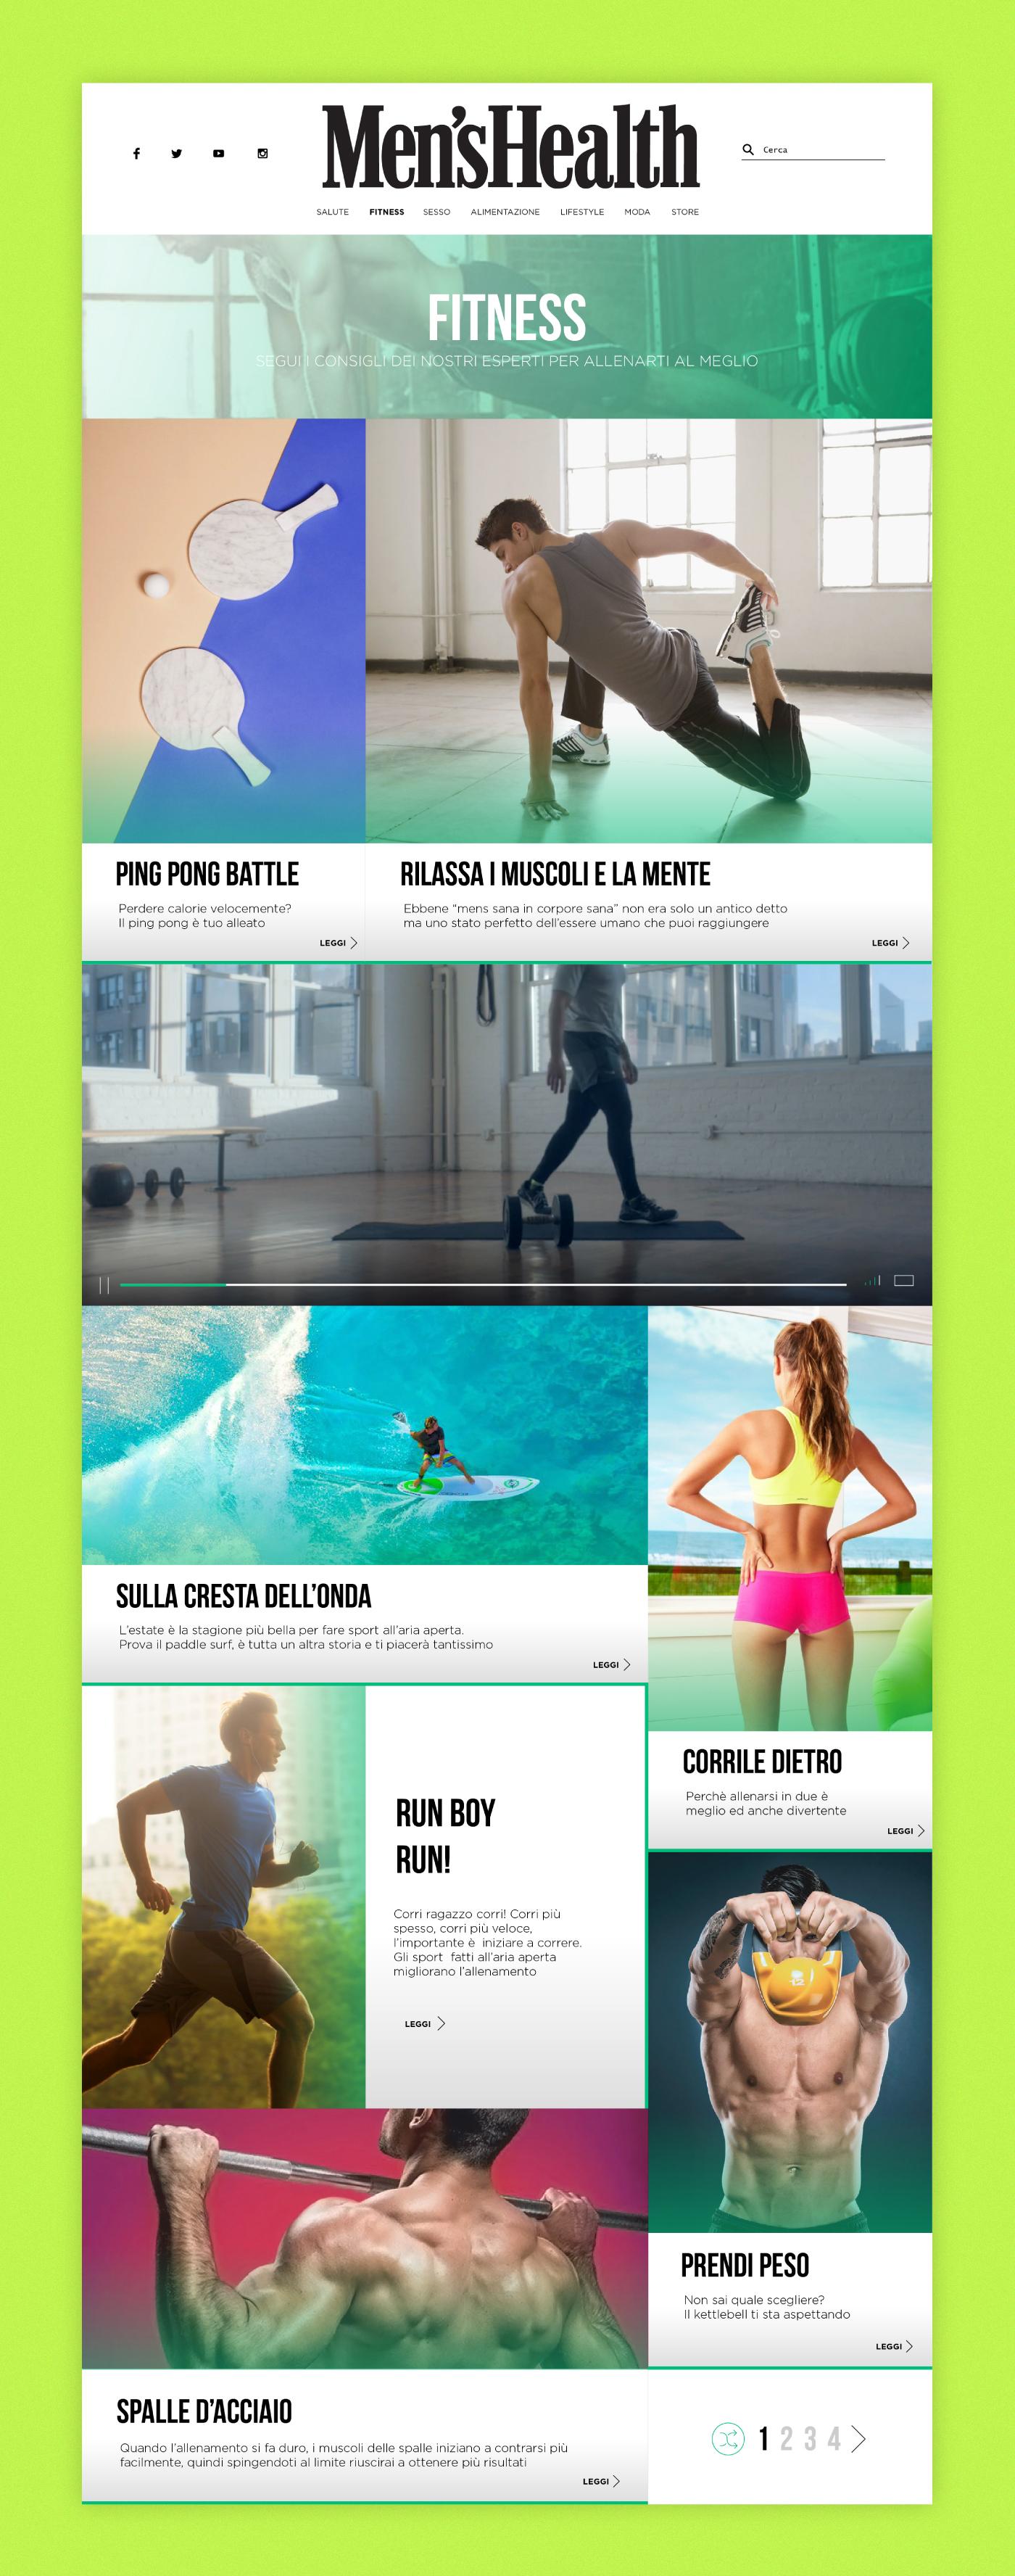 UI ux Web design milano men's Health magazine sport Interface app domenico ruffo apple watch